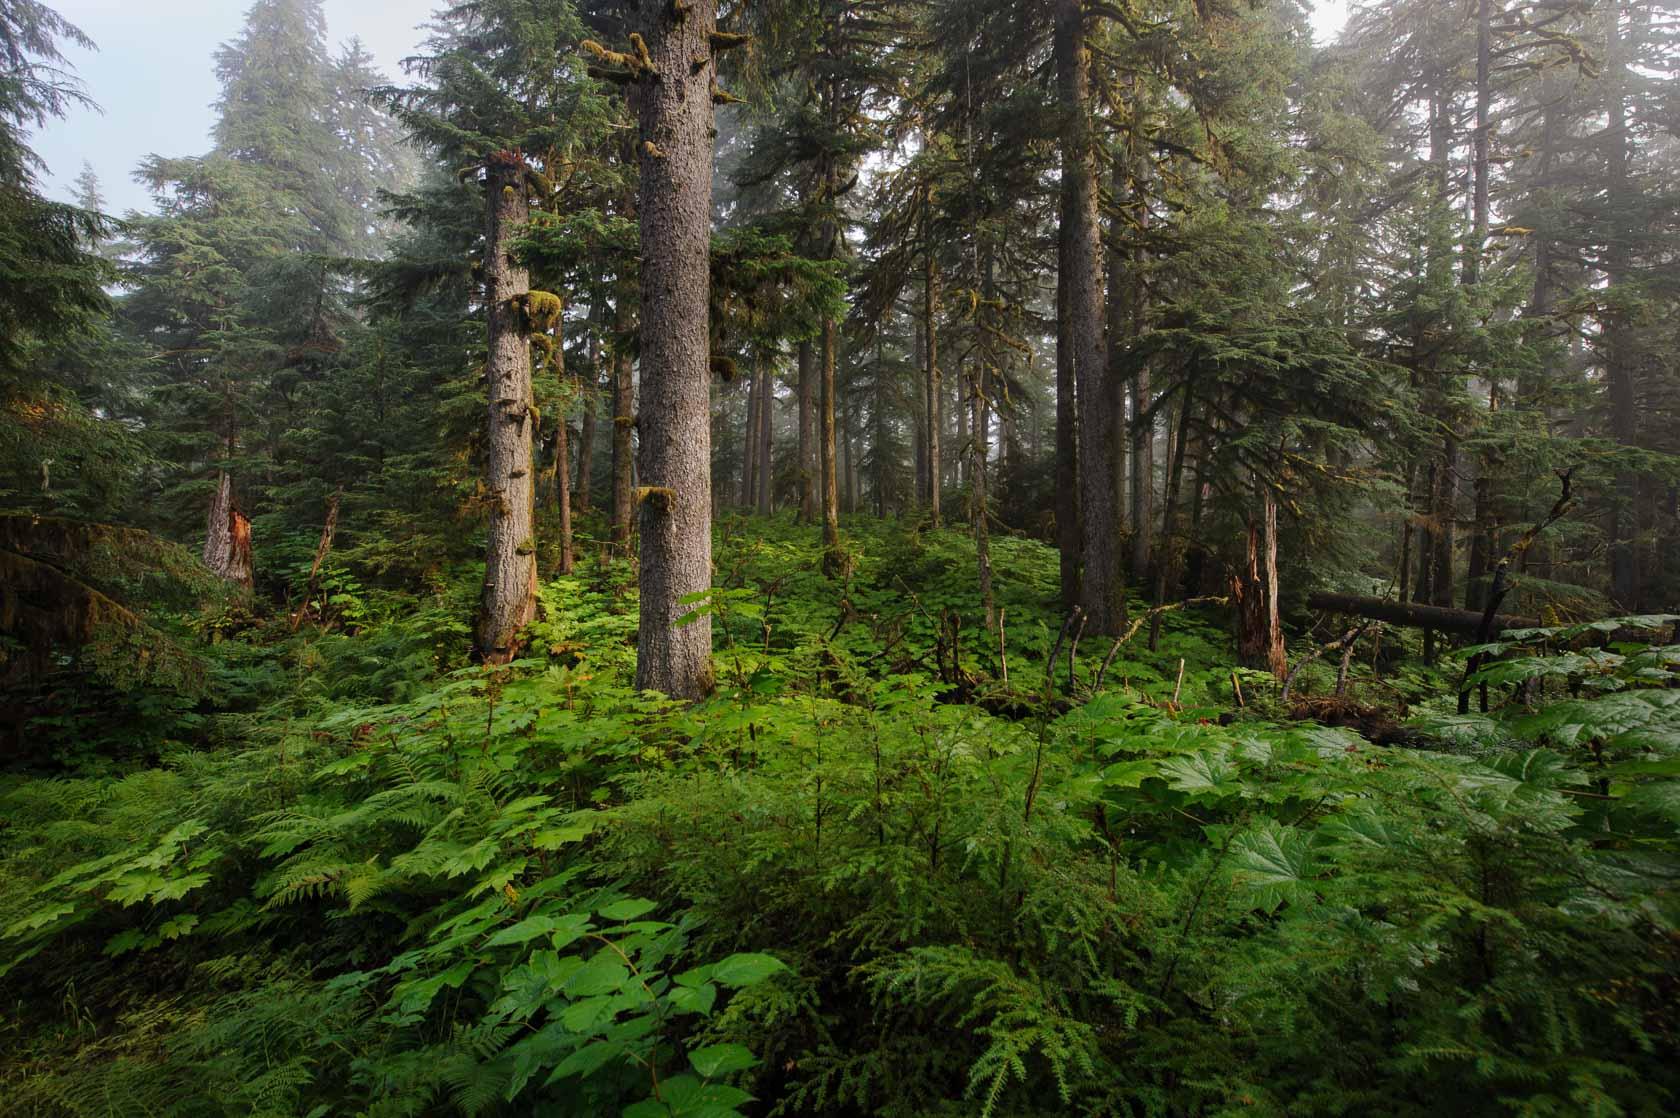 Coastal Rain Forest, Wrangell, Alaska